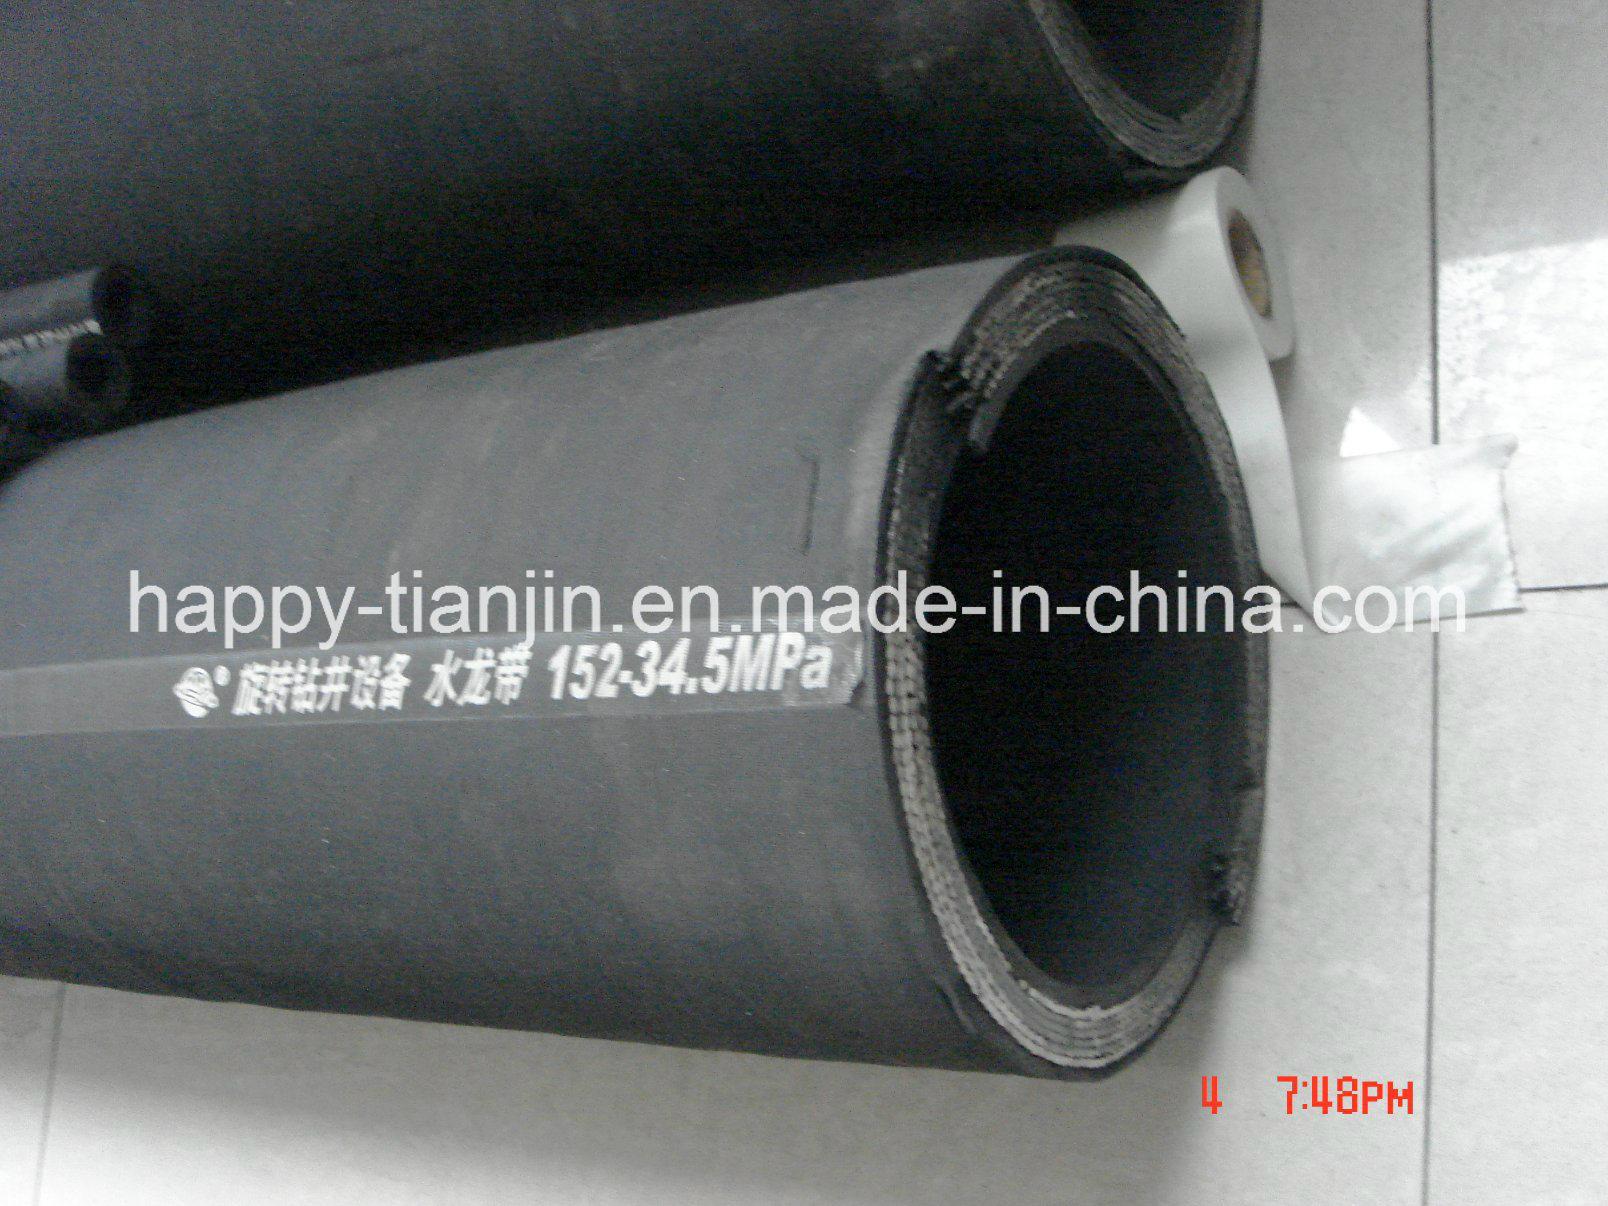 R15 Heavy Duty Impulsive Four or Six High Pressure Rubber Hydraulic Hose